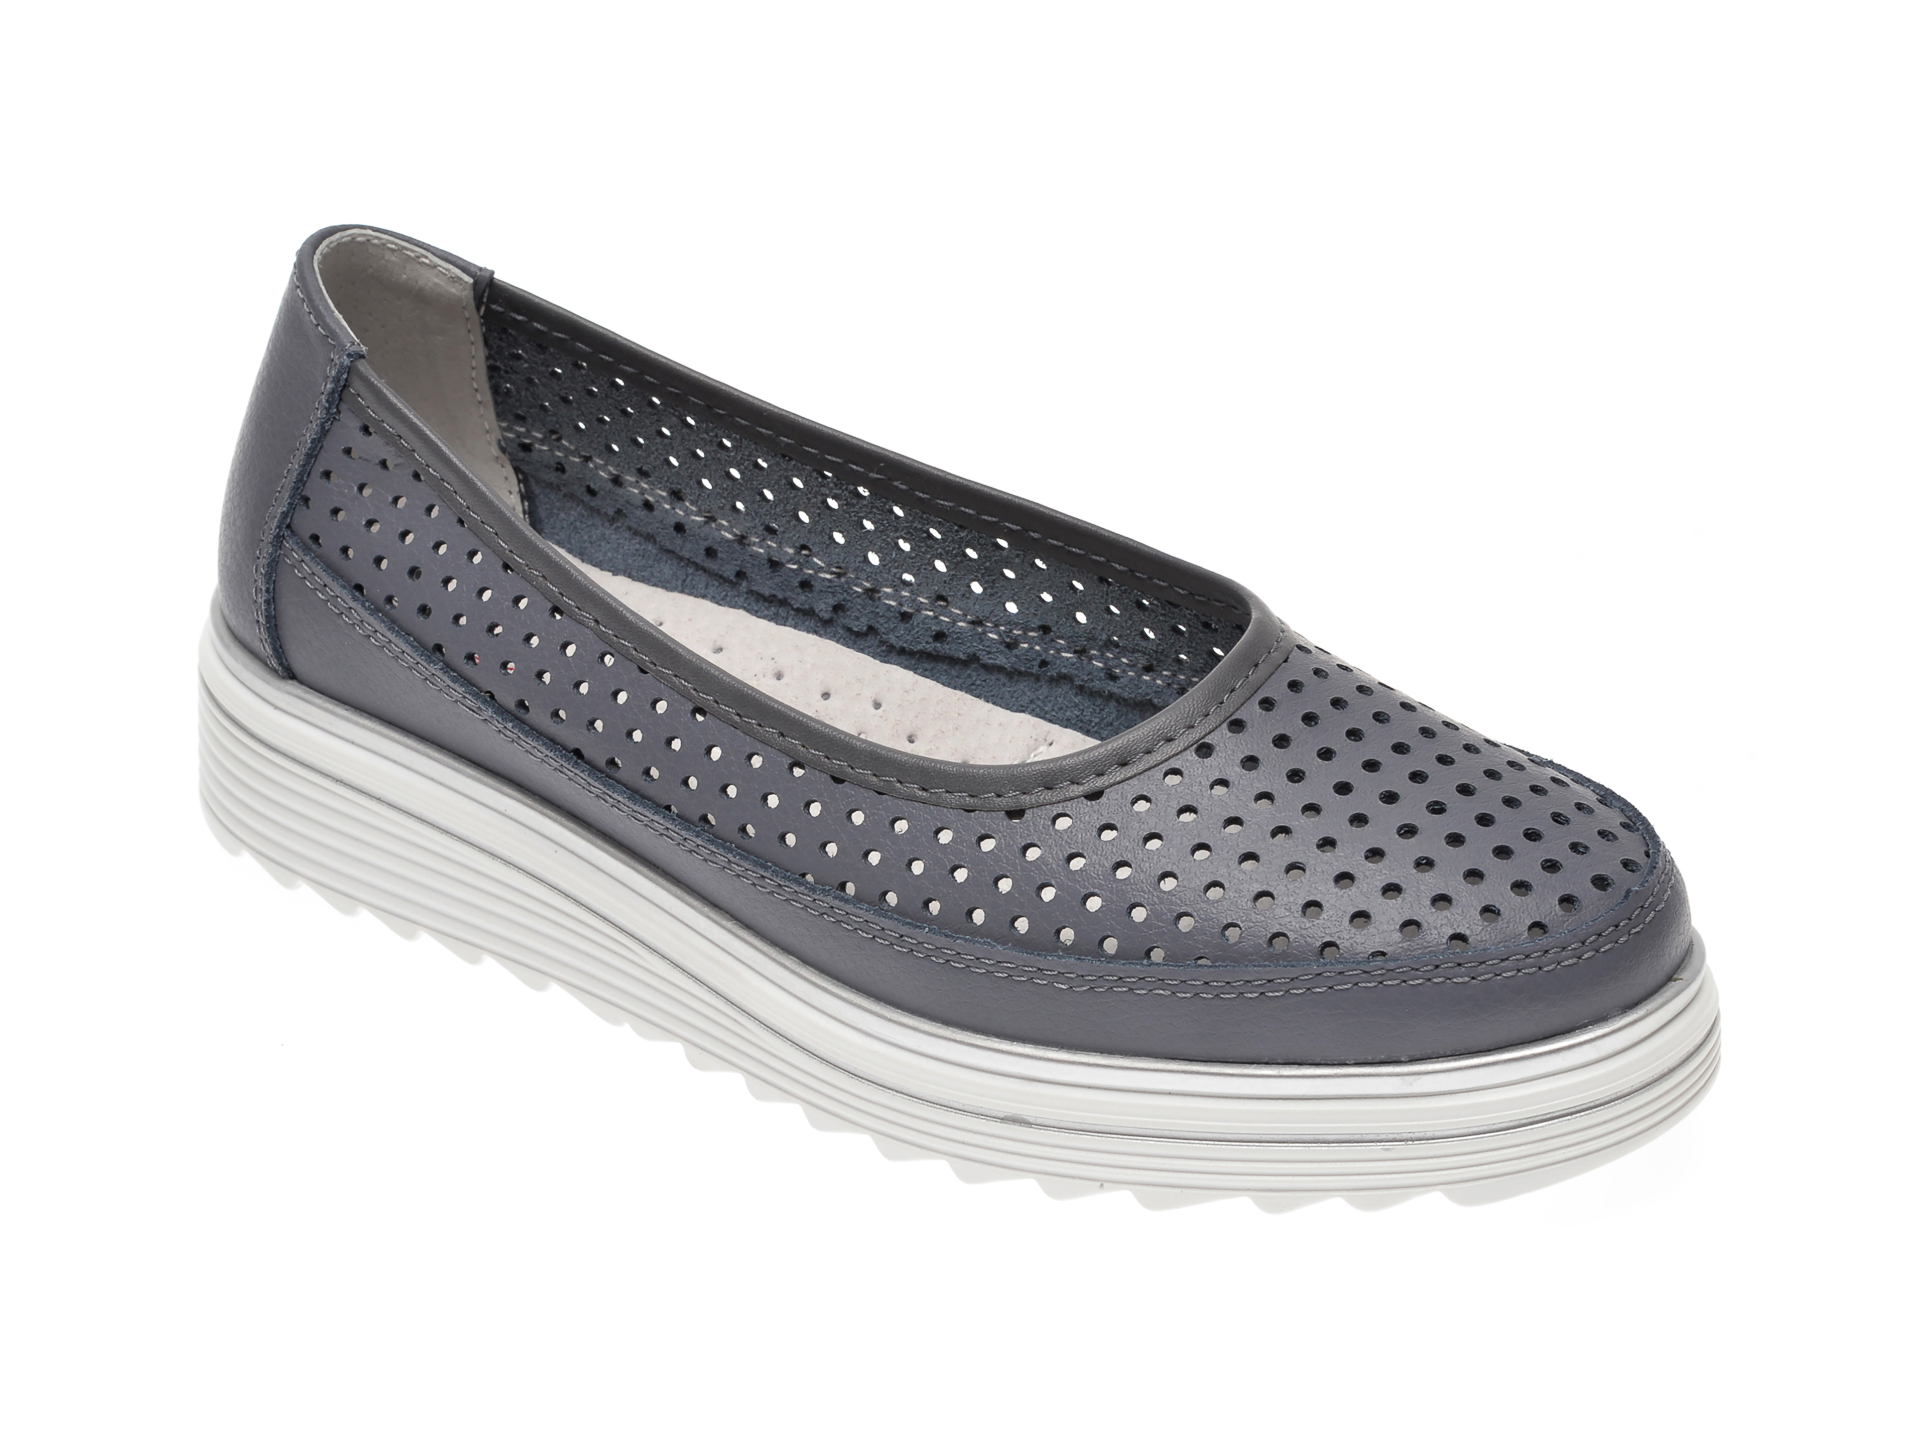 Pantofi IMAGE gri, 805, din piele naturala imagine